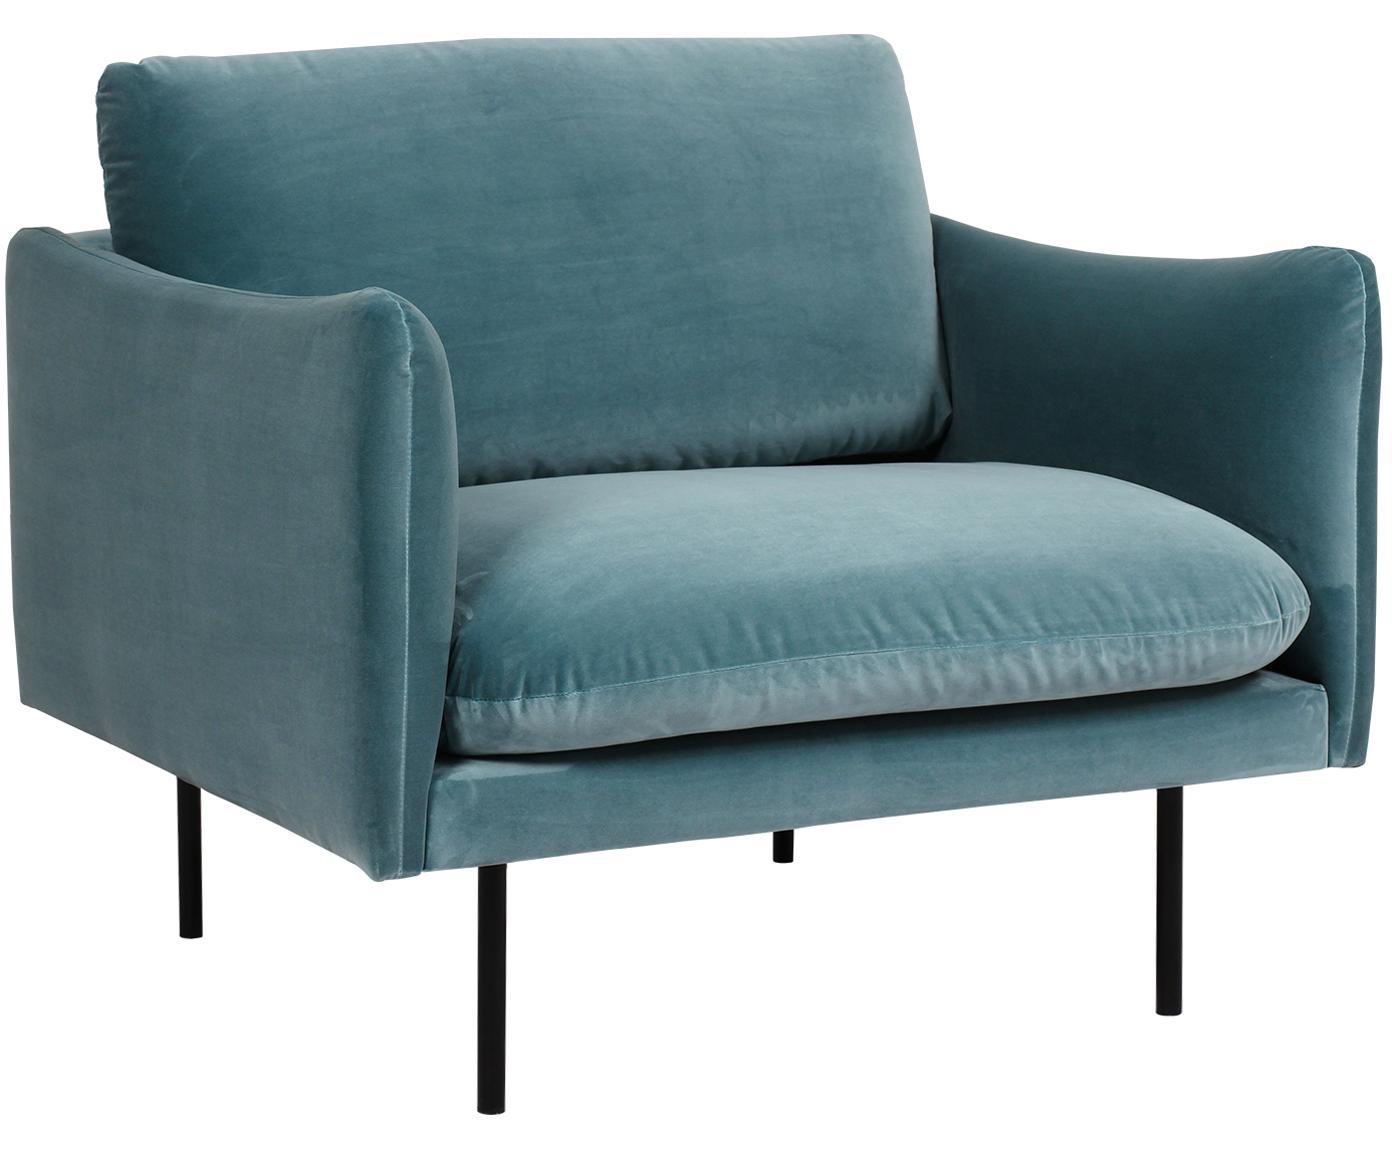 Samt-Sessel Moby, Bezug: Samt (Hochwertiger Polyes, Gestell: Massives Kiefernholz, Füße: Metall, pulverbeschichtet, Samt Türkis, B 90 x T 90 cm